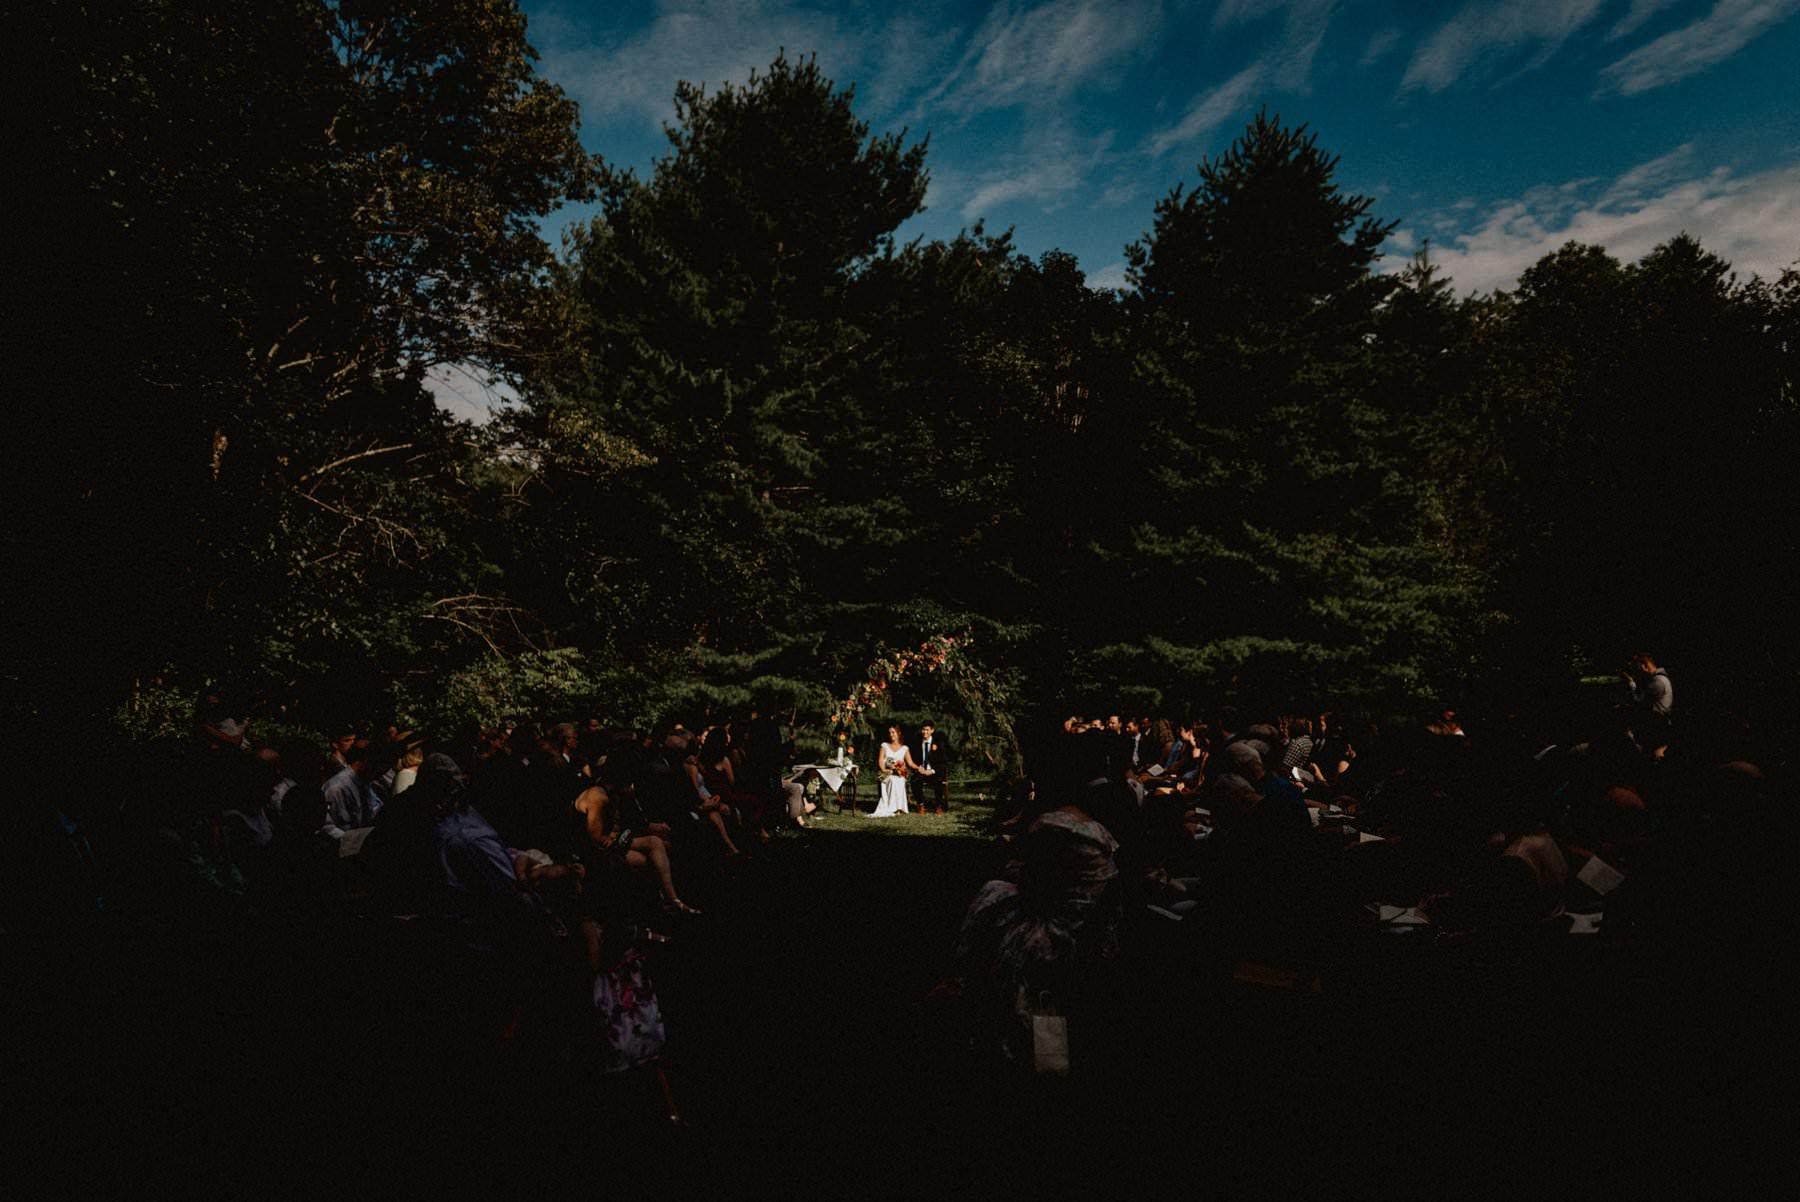 pennsylvania-private-estate-wedding-72.jpg